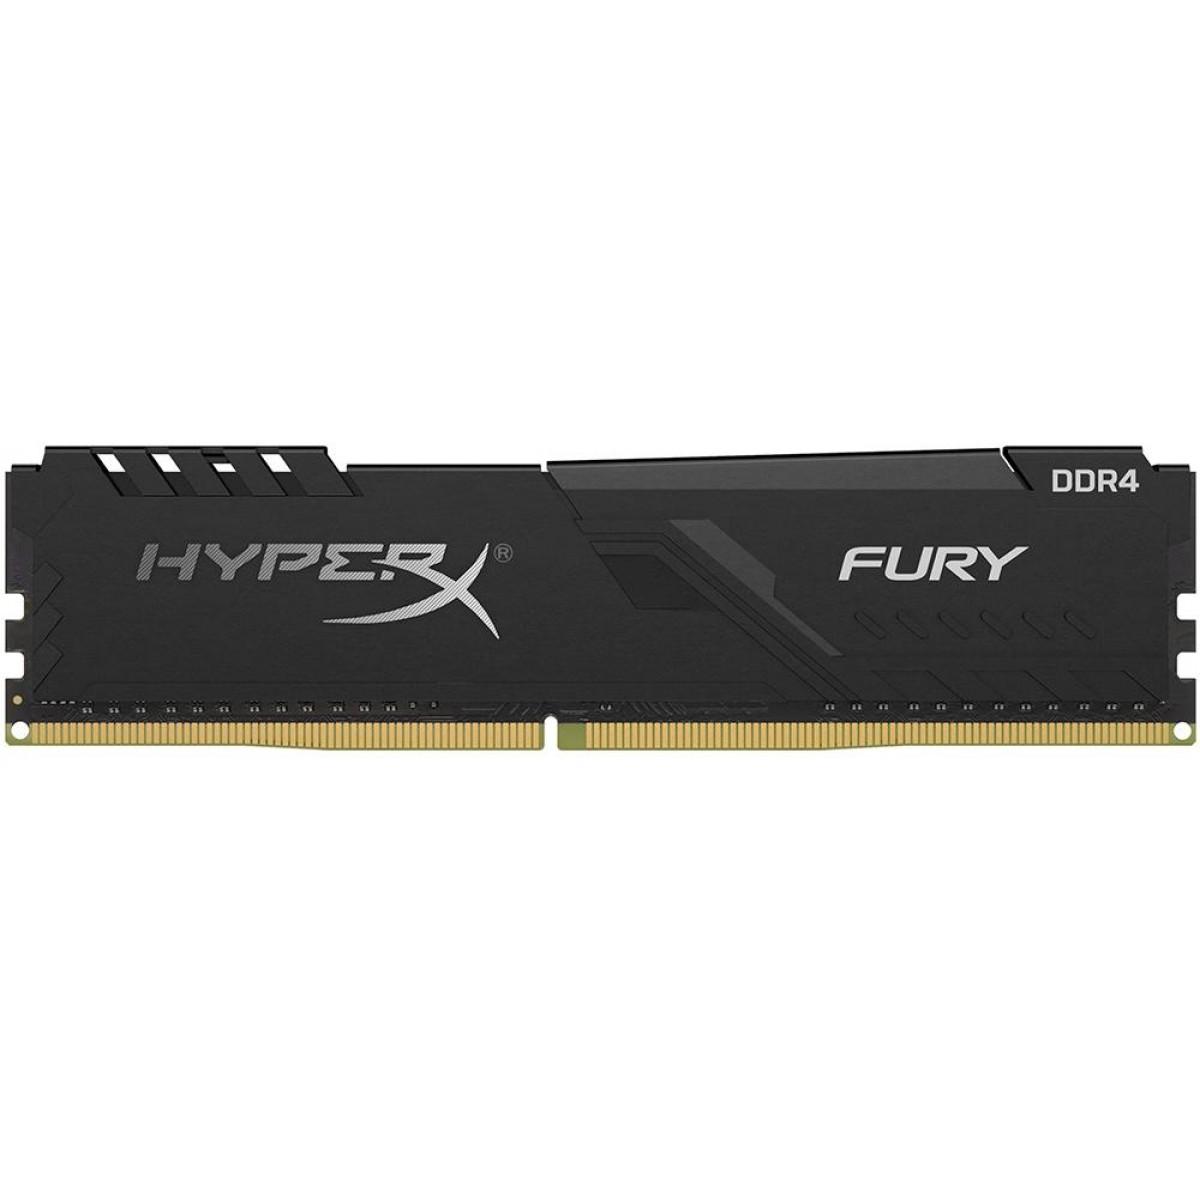 Memória DDR4 Kingston HyperX Fury, 16GB 2666MHz, Black, HX426C16FB3/16